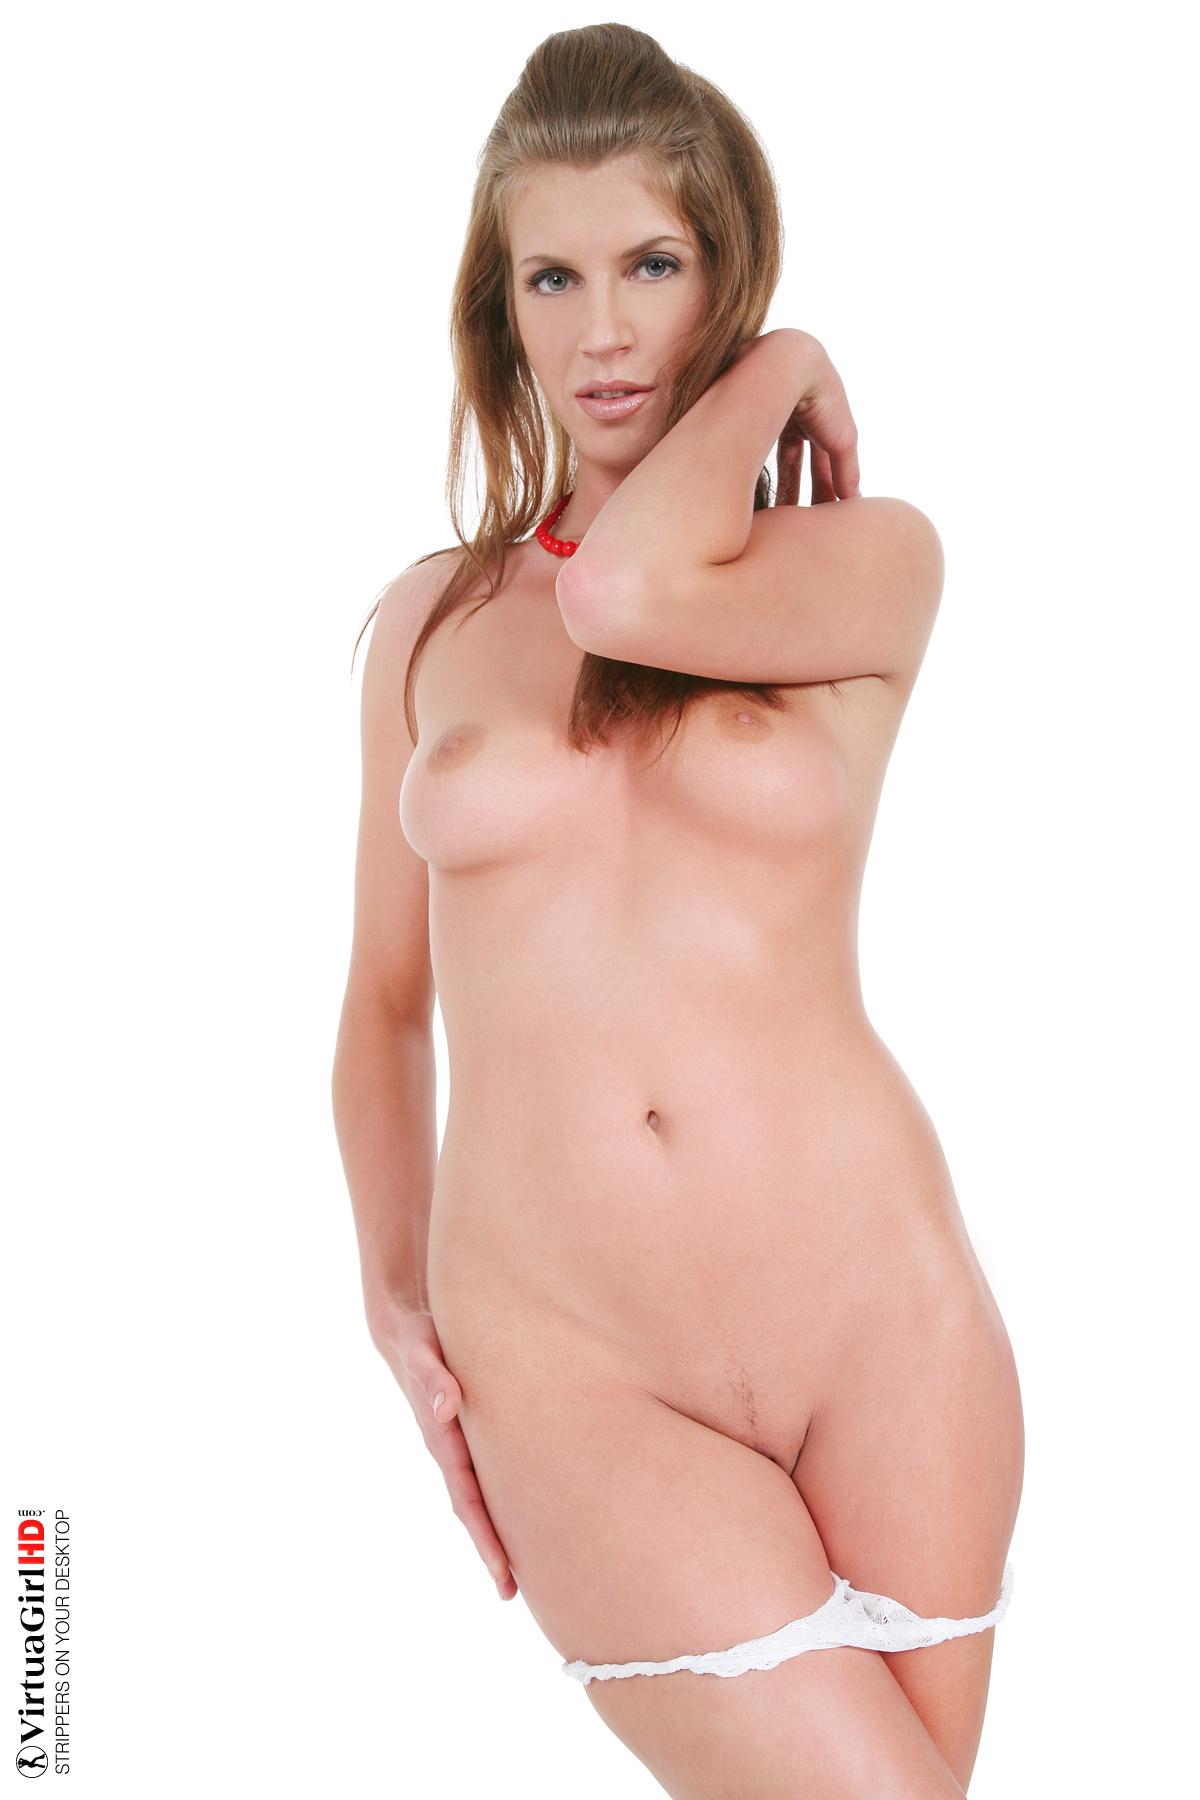 girls wallpapers nude imgur